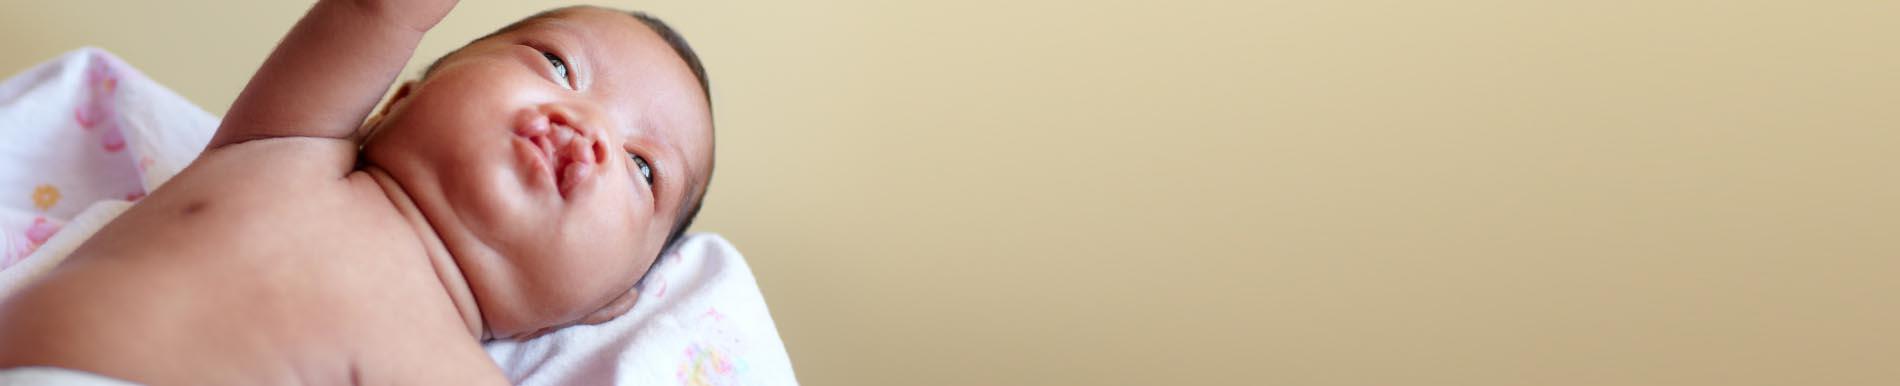 https://www.healthychildren.org/SiteCollectionImage-Homepage-Banners/Cleft_Cranio_Baby_Banner.jpg